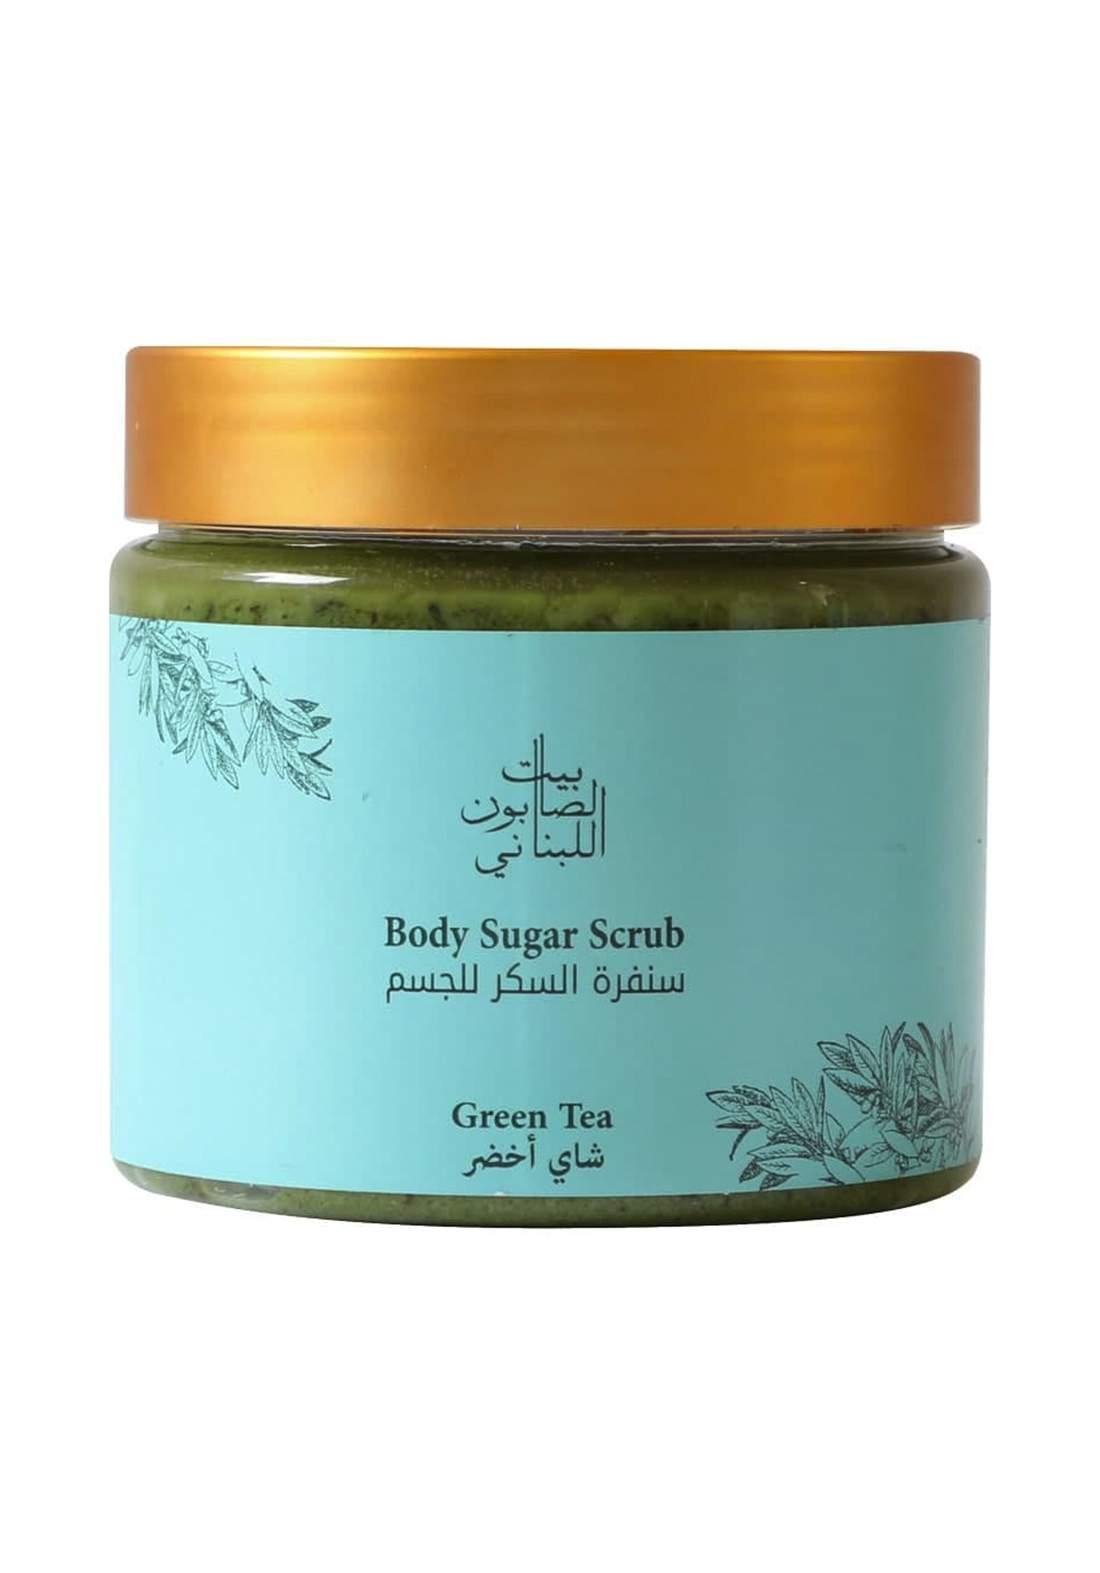 Bayt Alsaboun Alloubnani-320717 Body Sugar Scrub Green Tea 500g سنفرة